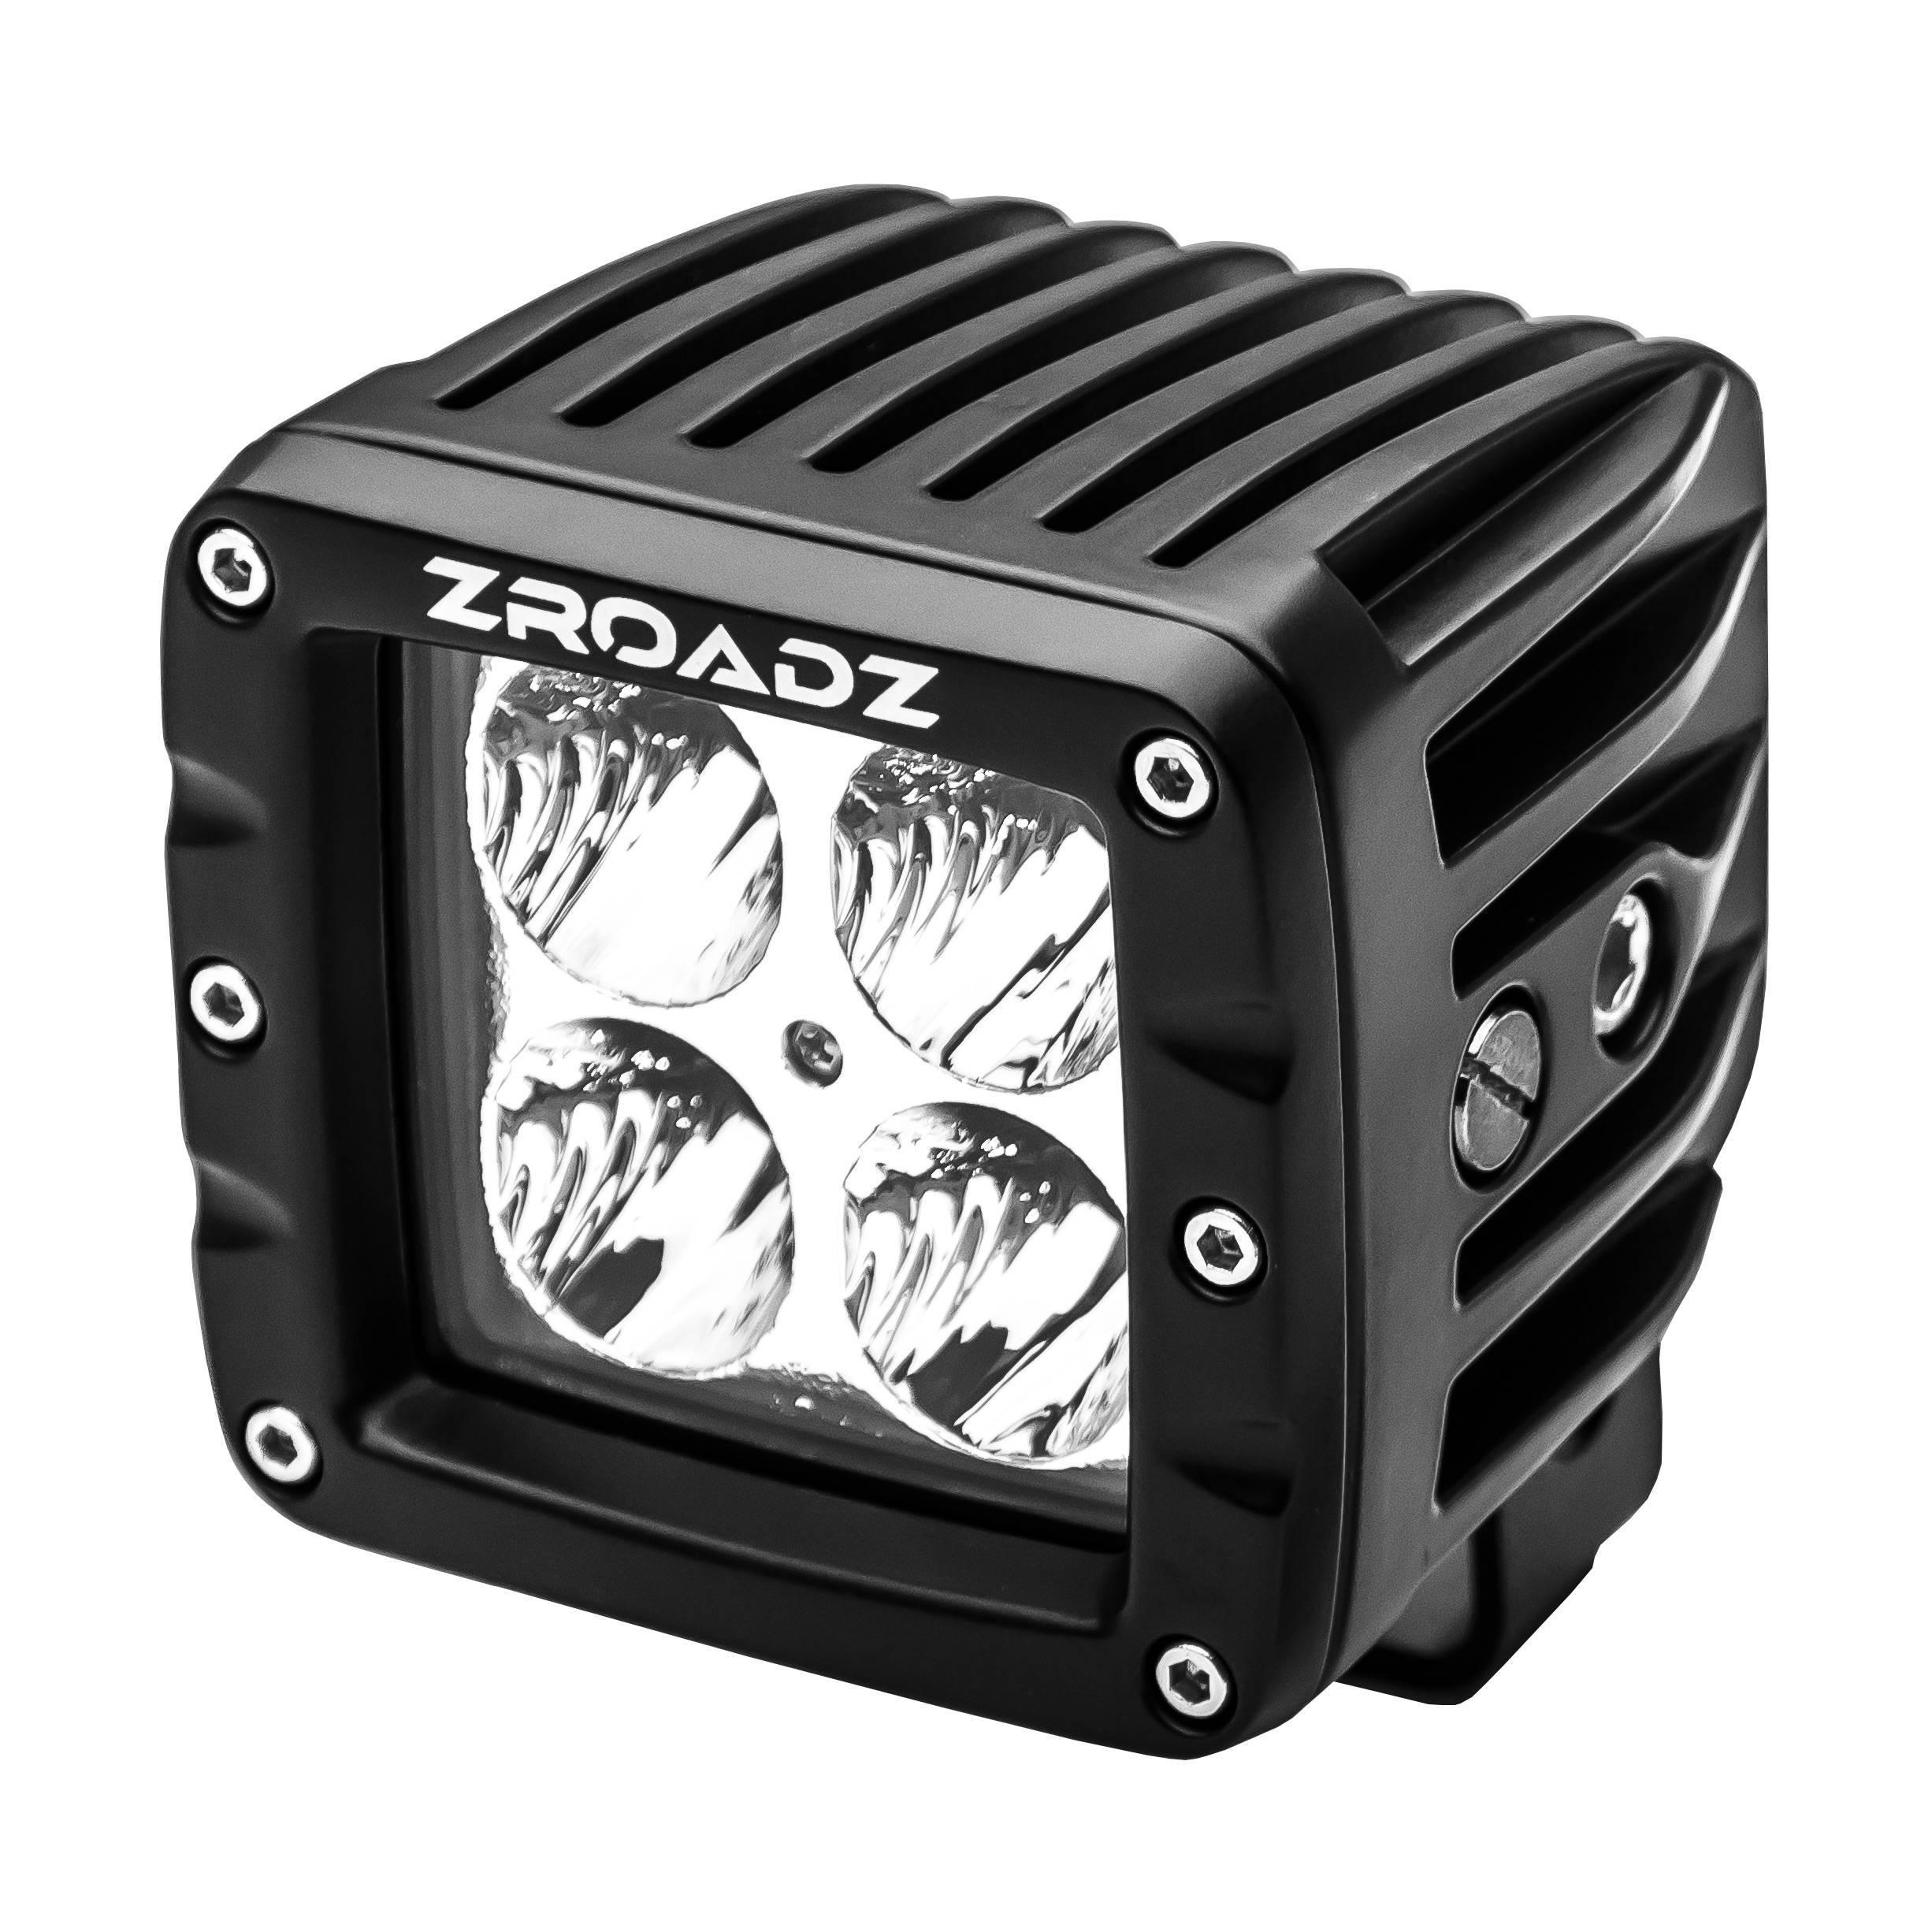 ZROADZ                                             - 3 Inch LED Flood Beam Pod Light - PN #Z30BC14W20